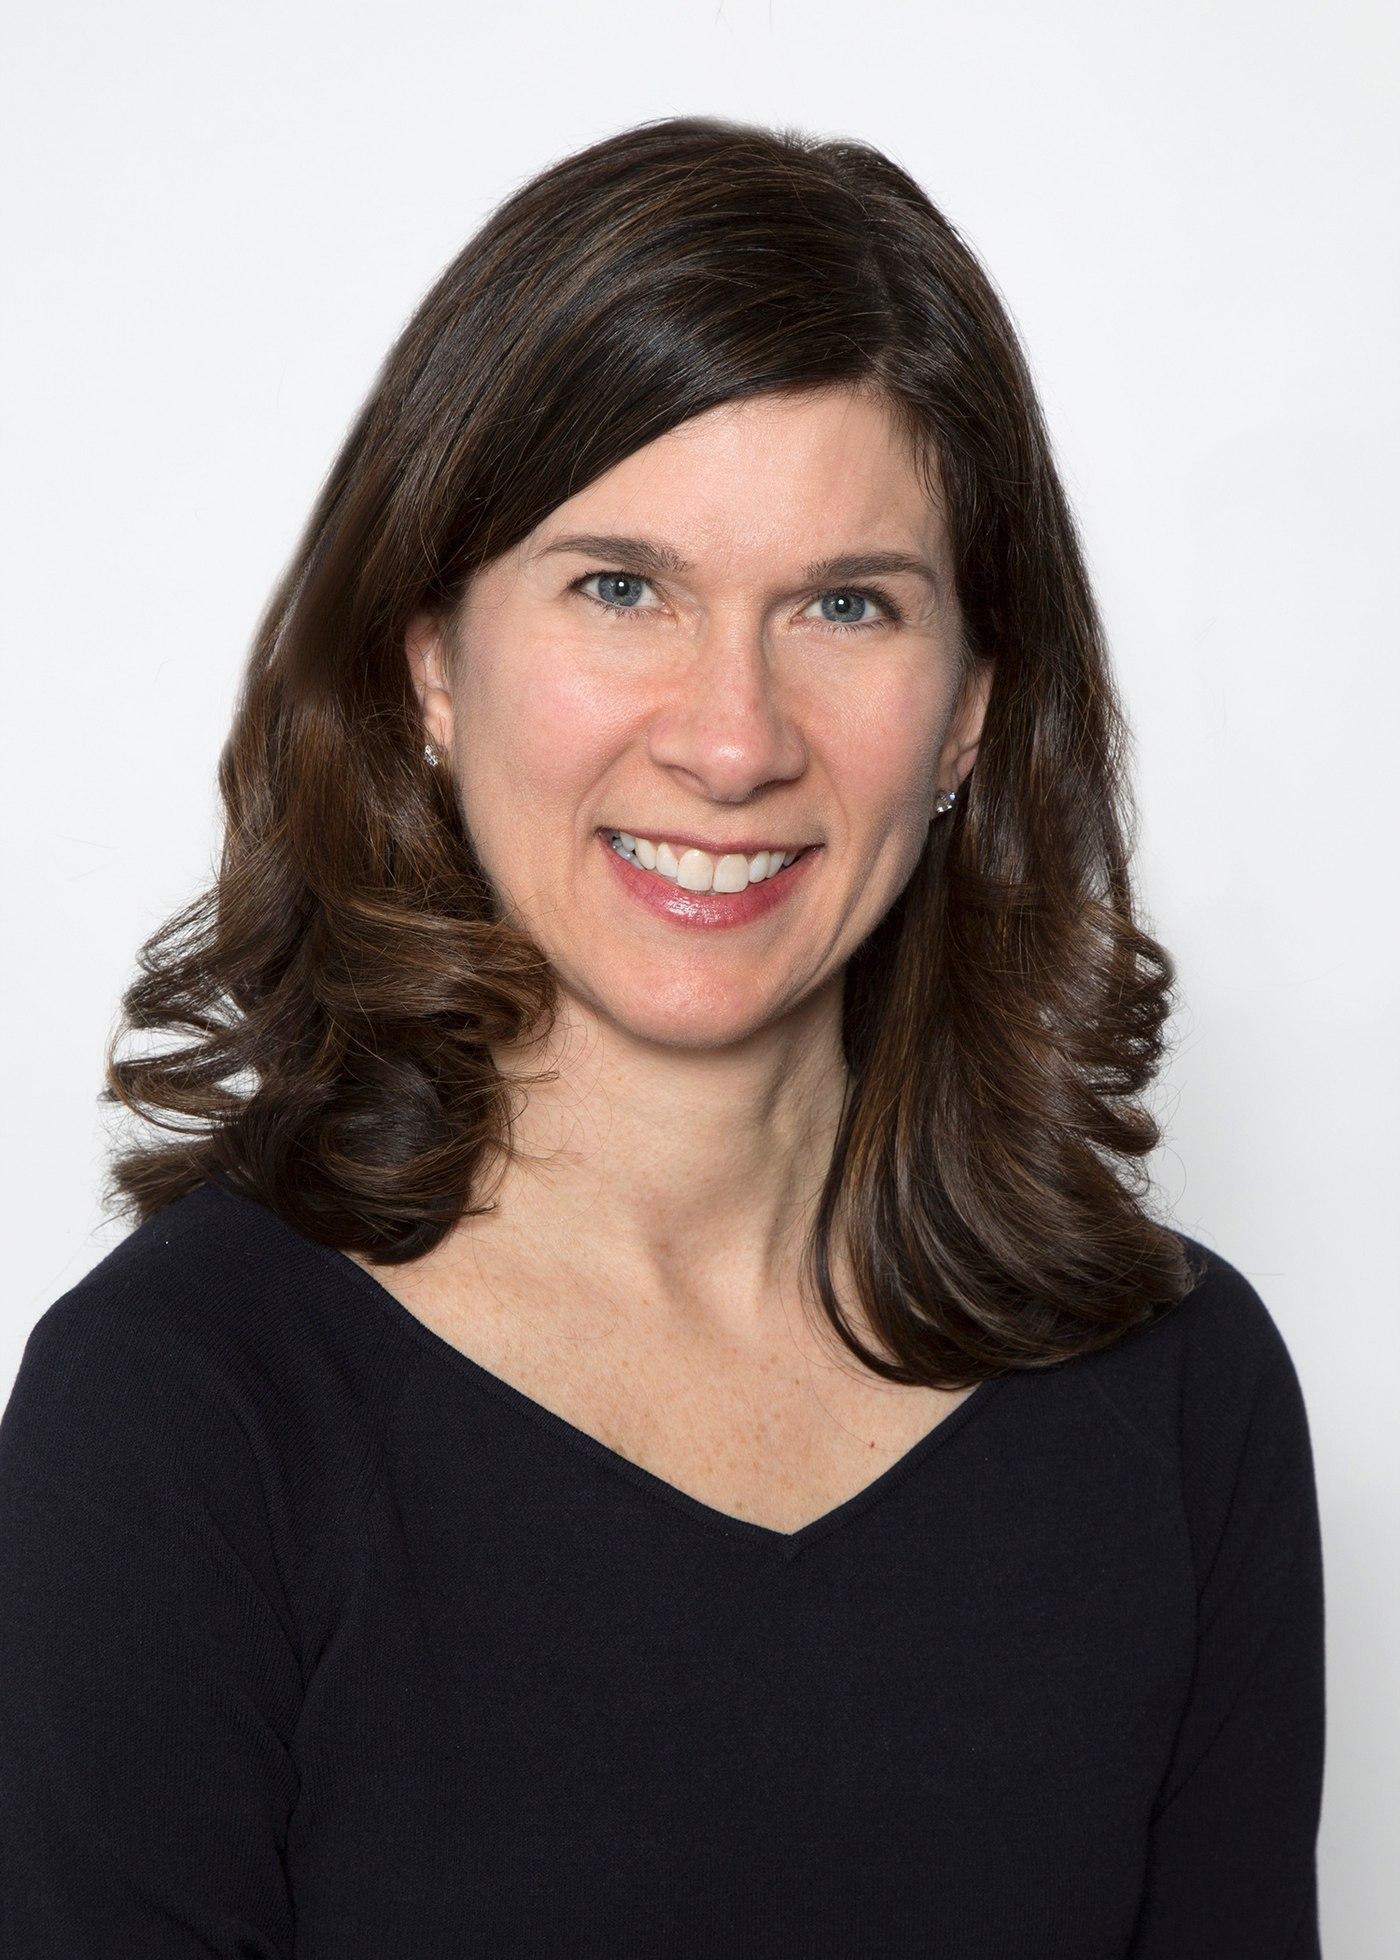 Dr. Amy Matton DACM, L.Ac